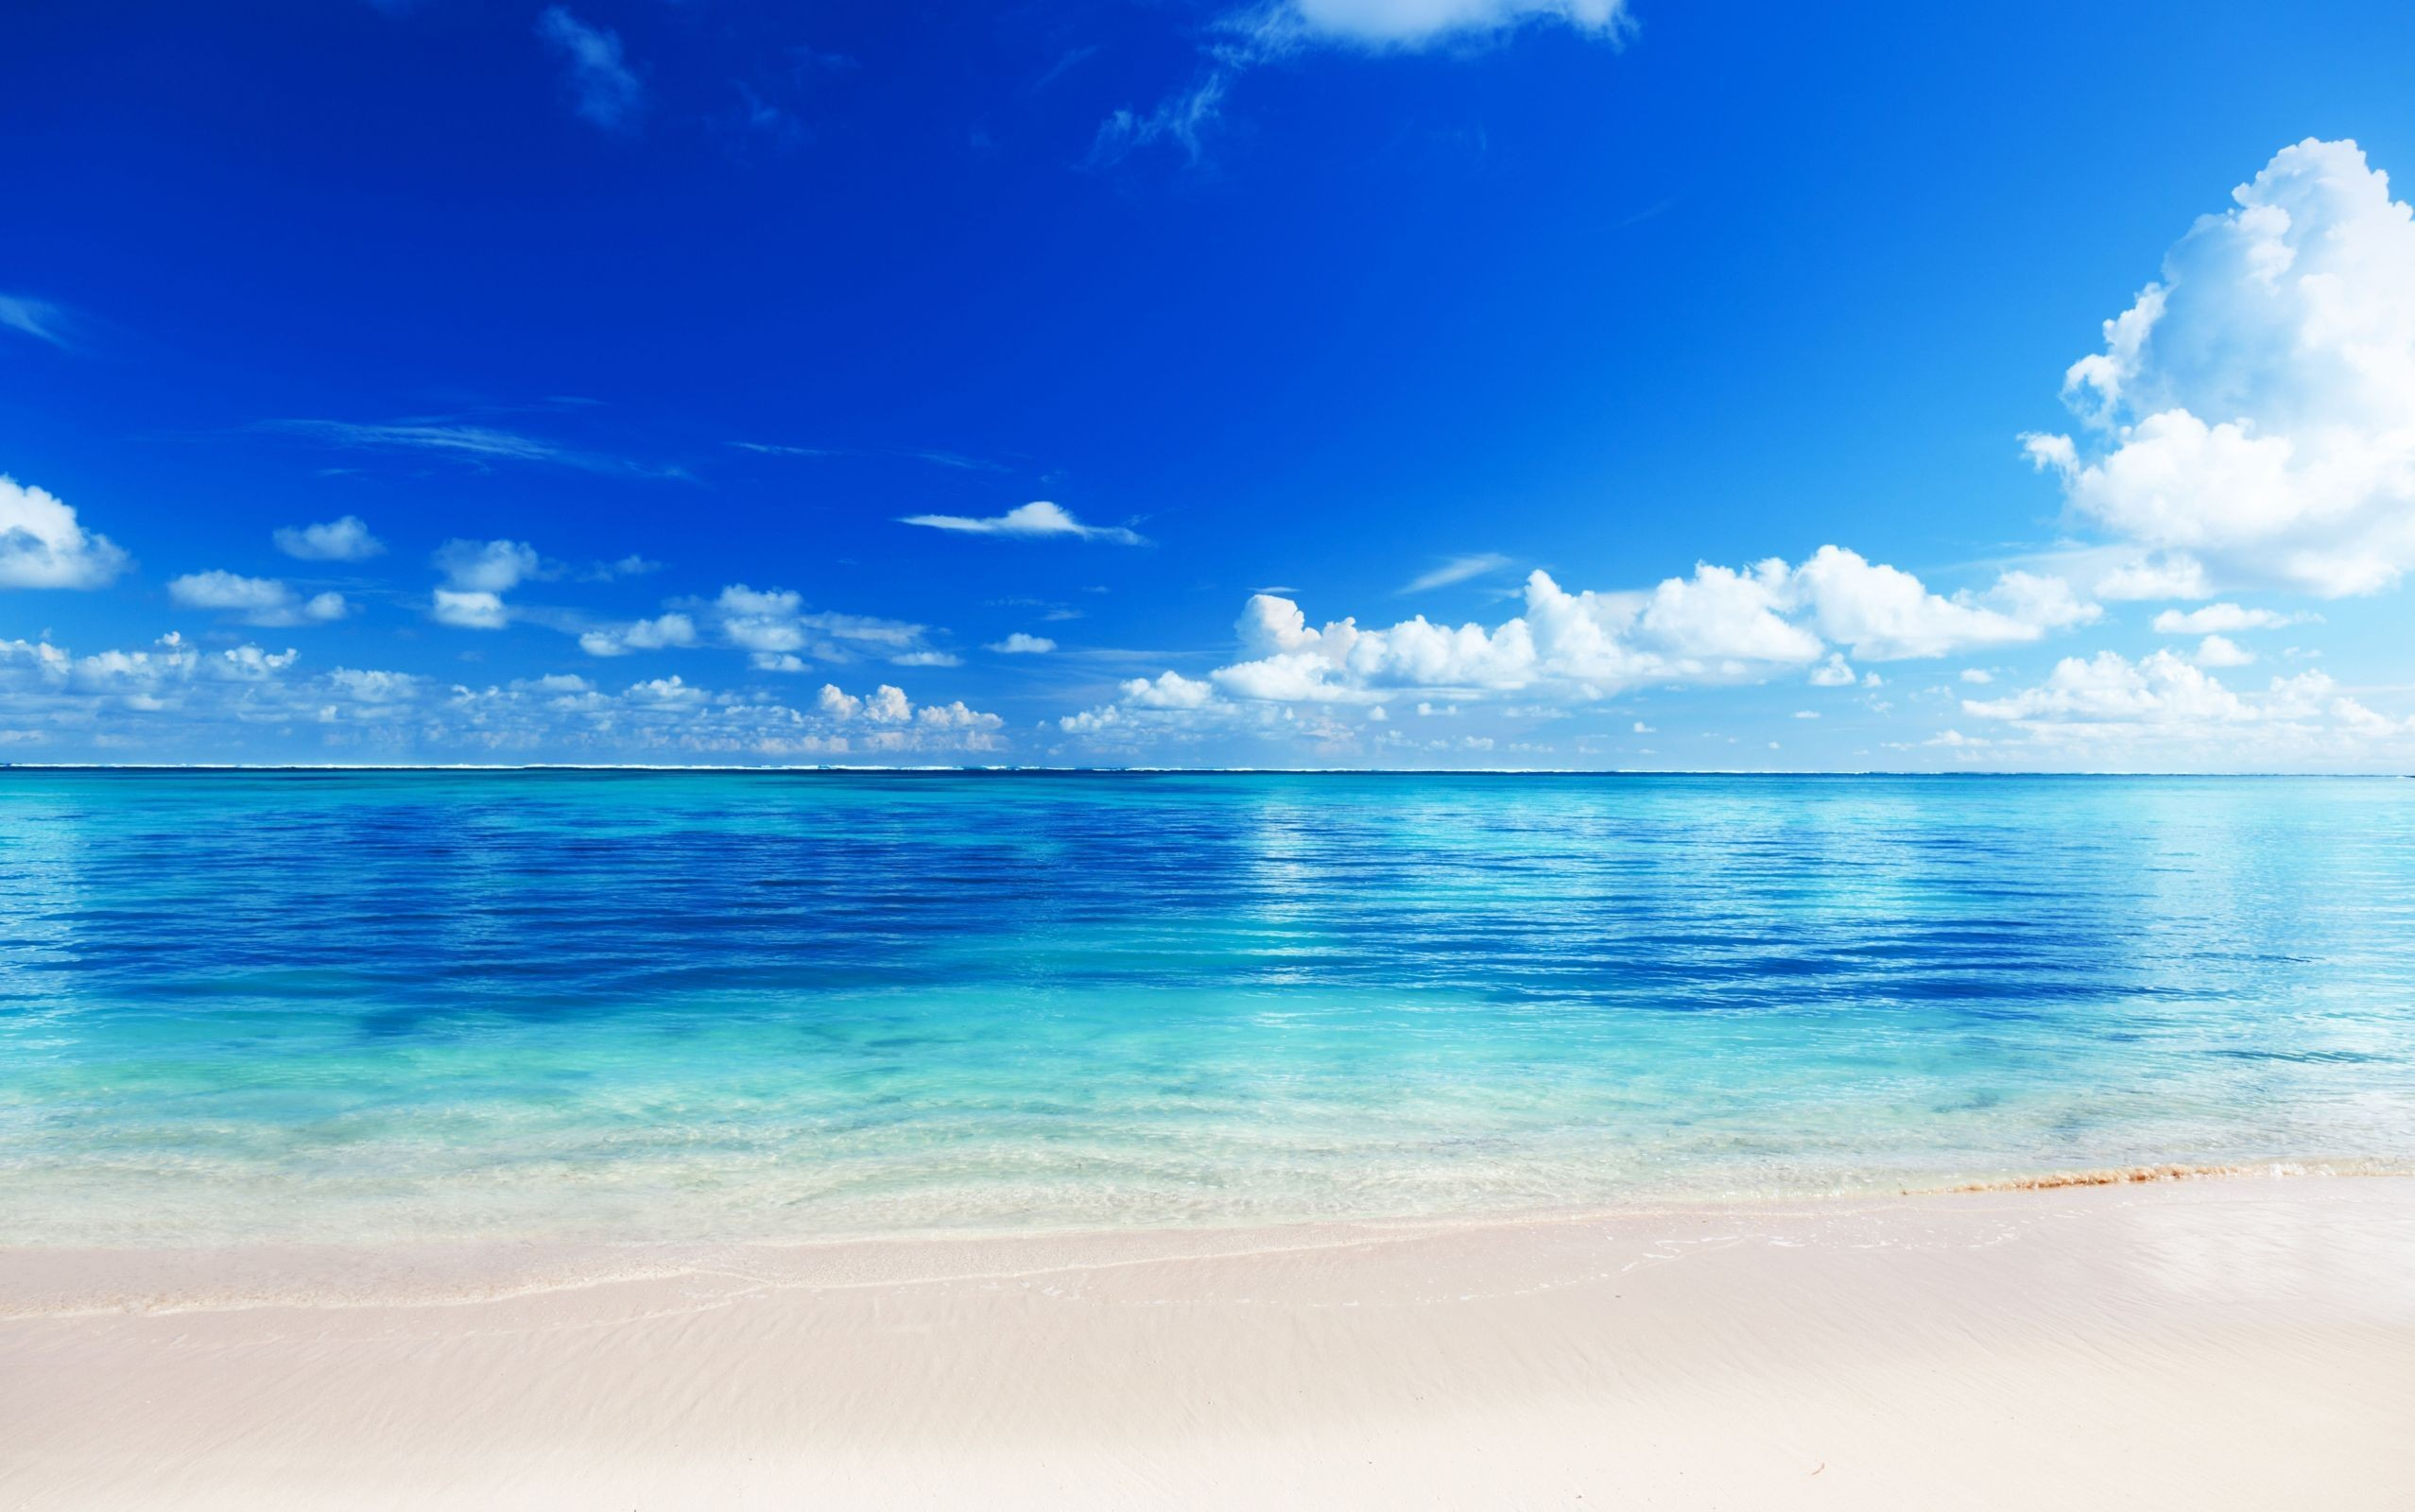 Beach Background ① Free Beautiful High Resolution